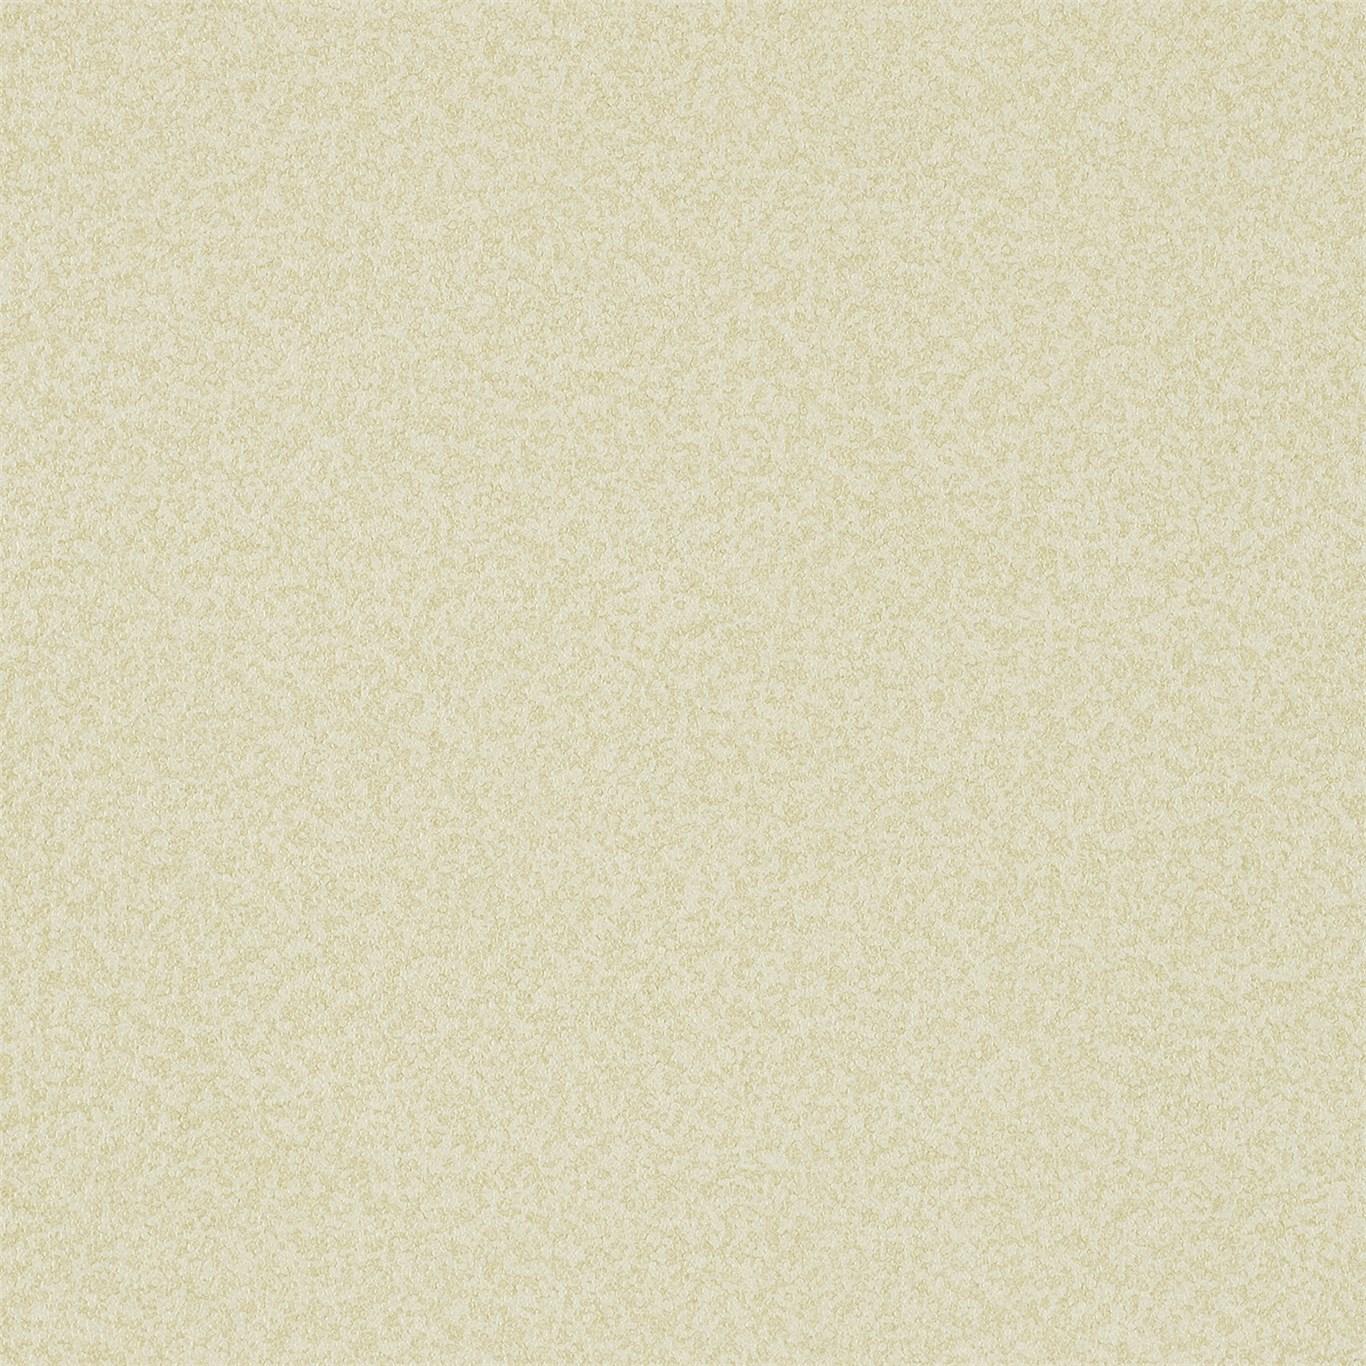 Английские обои Zoffany,  коллекция Prism Vinyls, артикул311764